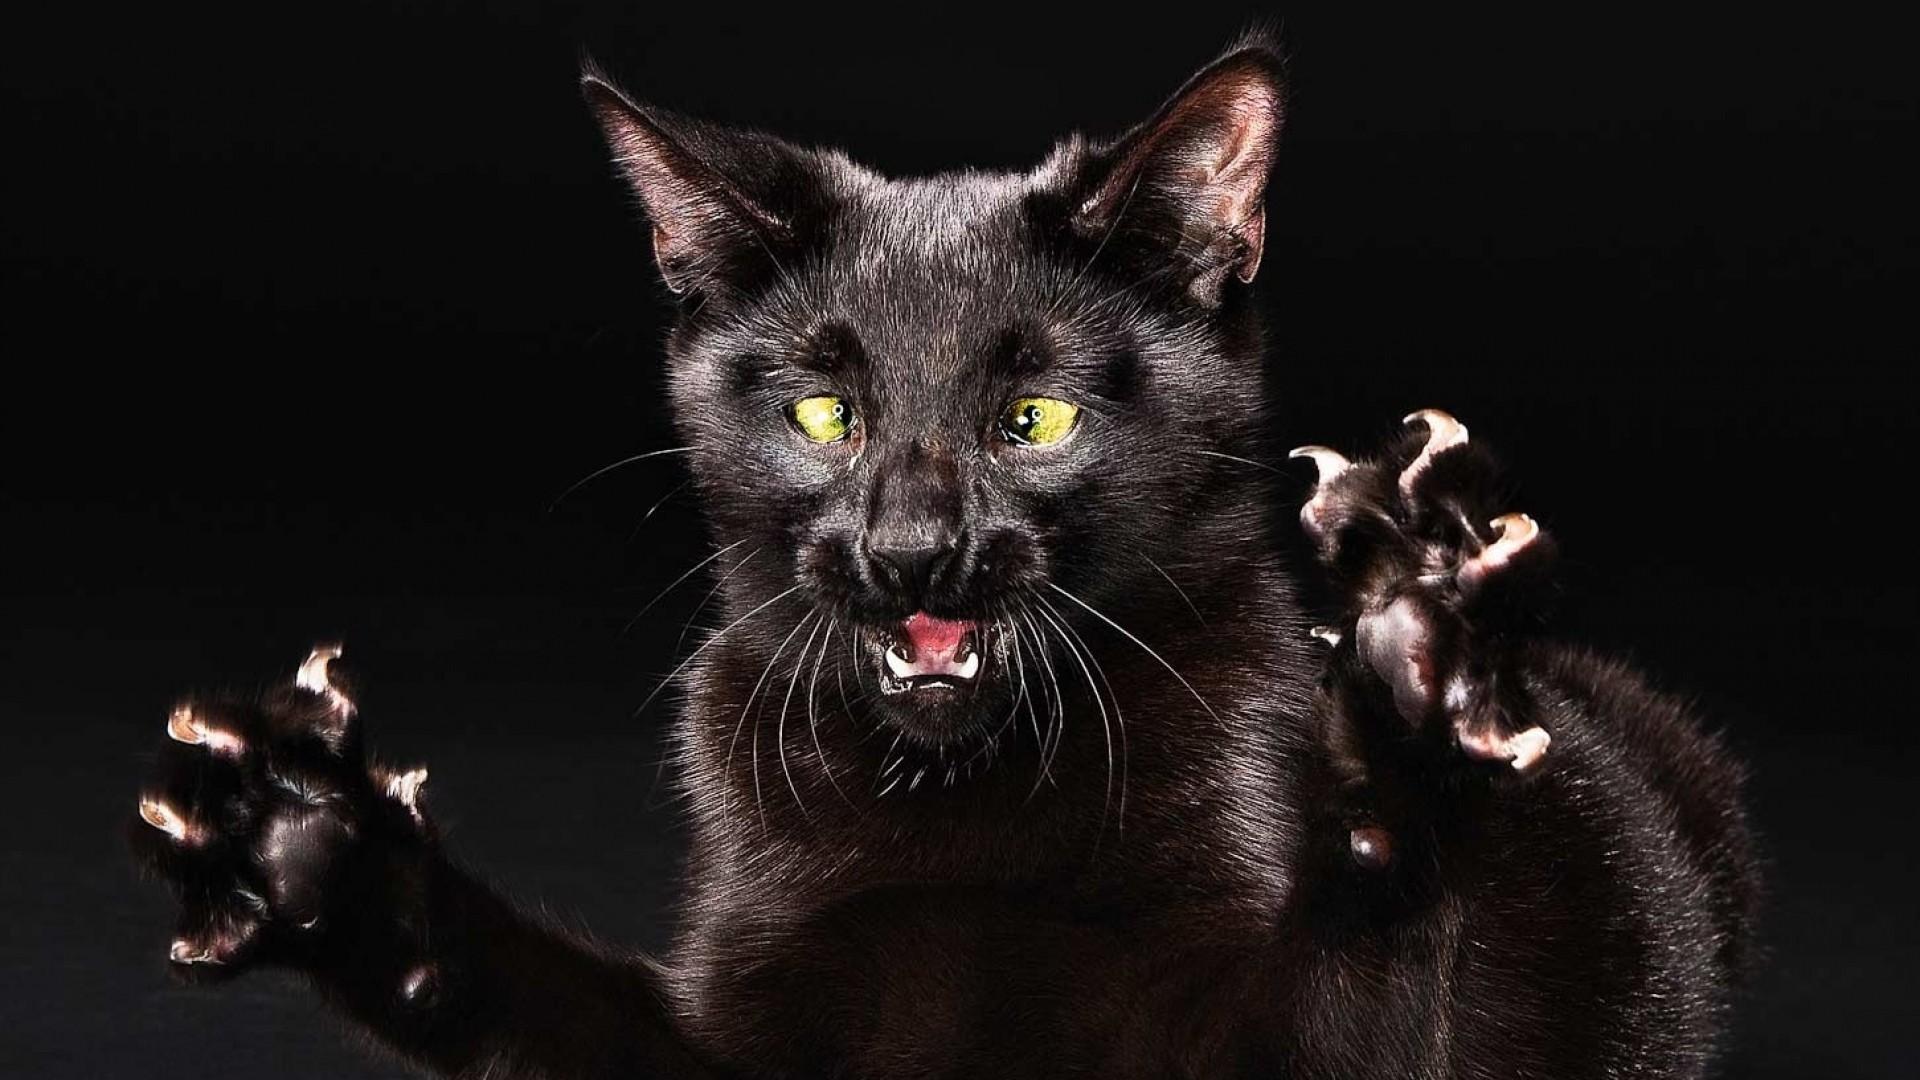 cat, funny, black